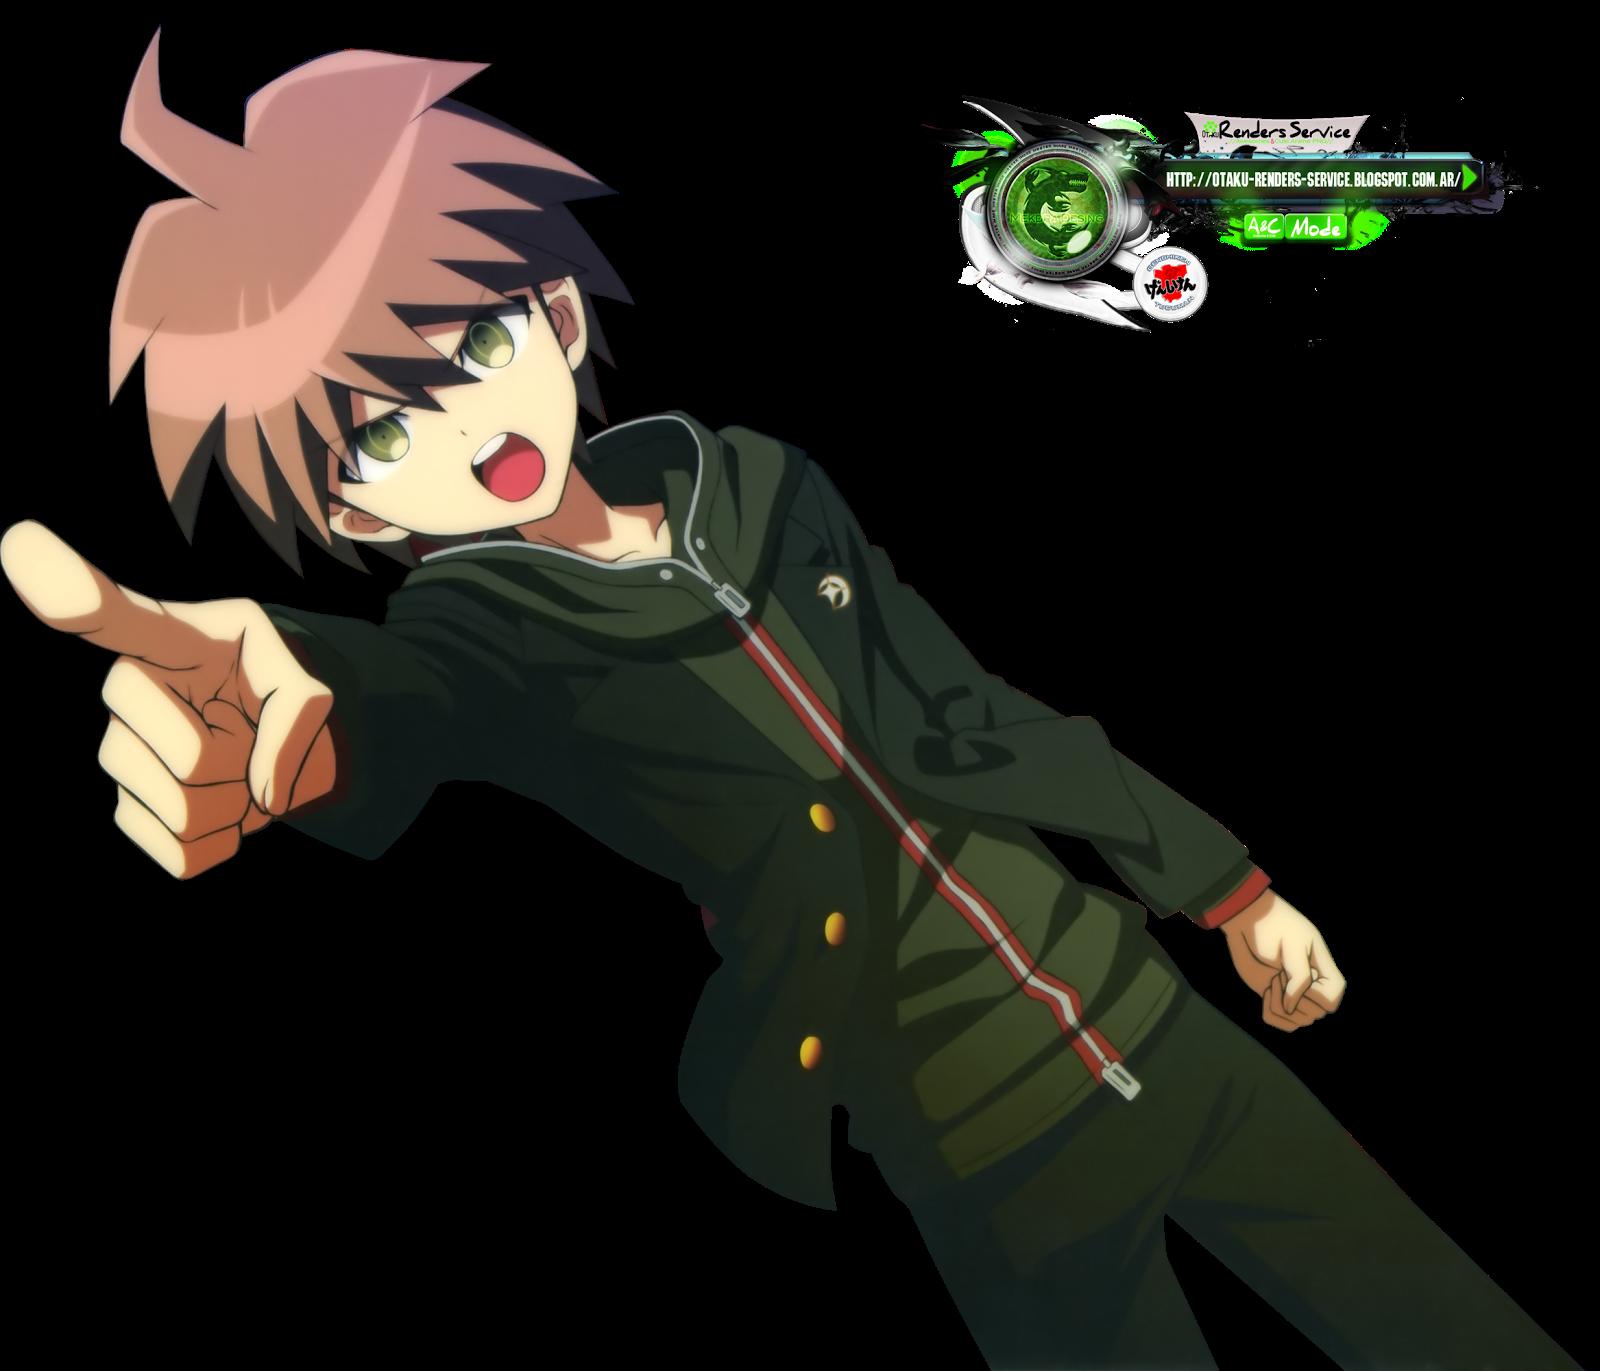 Danganronpa makoto naegi kakoiii hd render ors anime renders